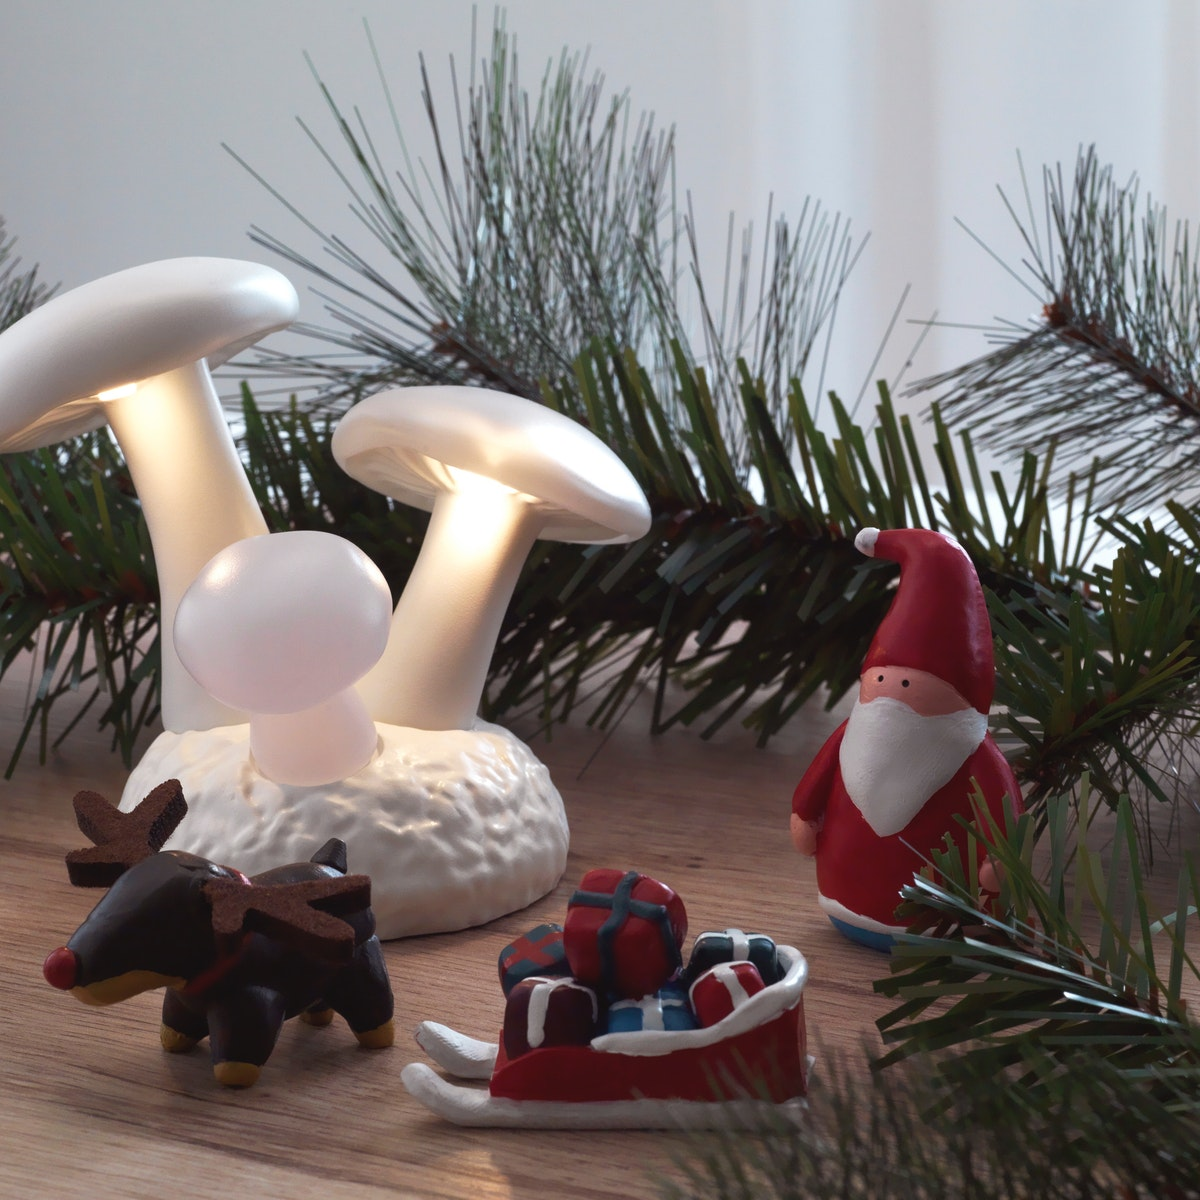 maket santa claus